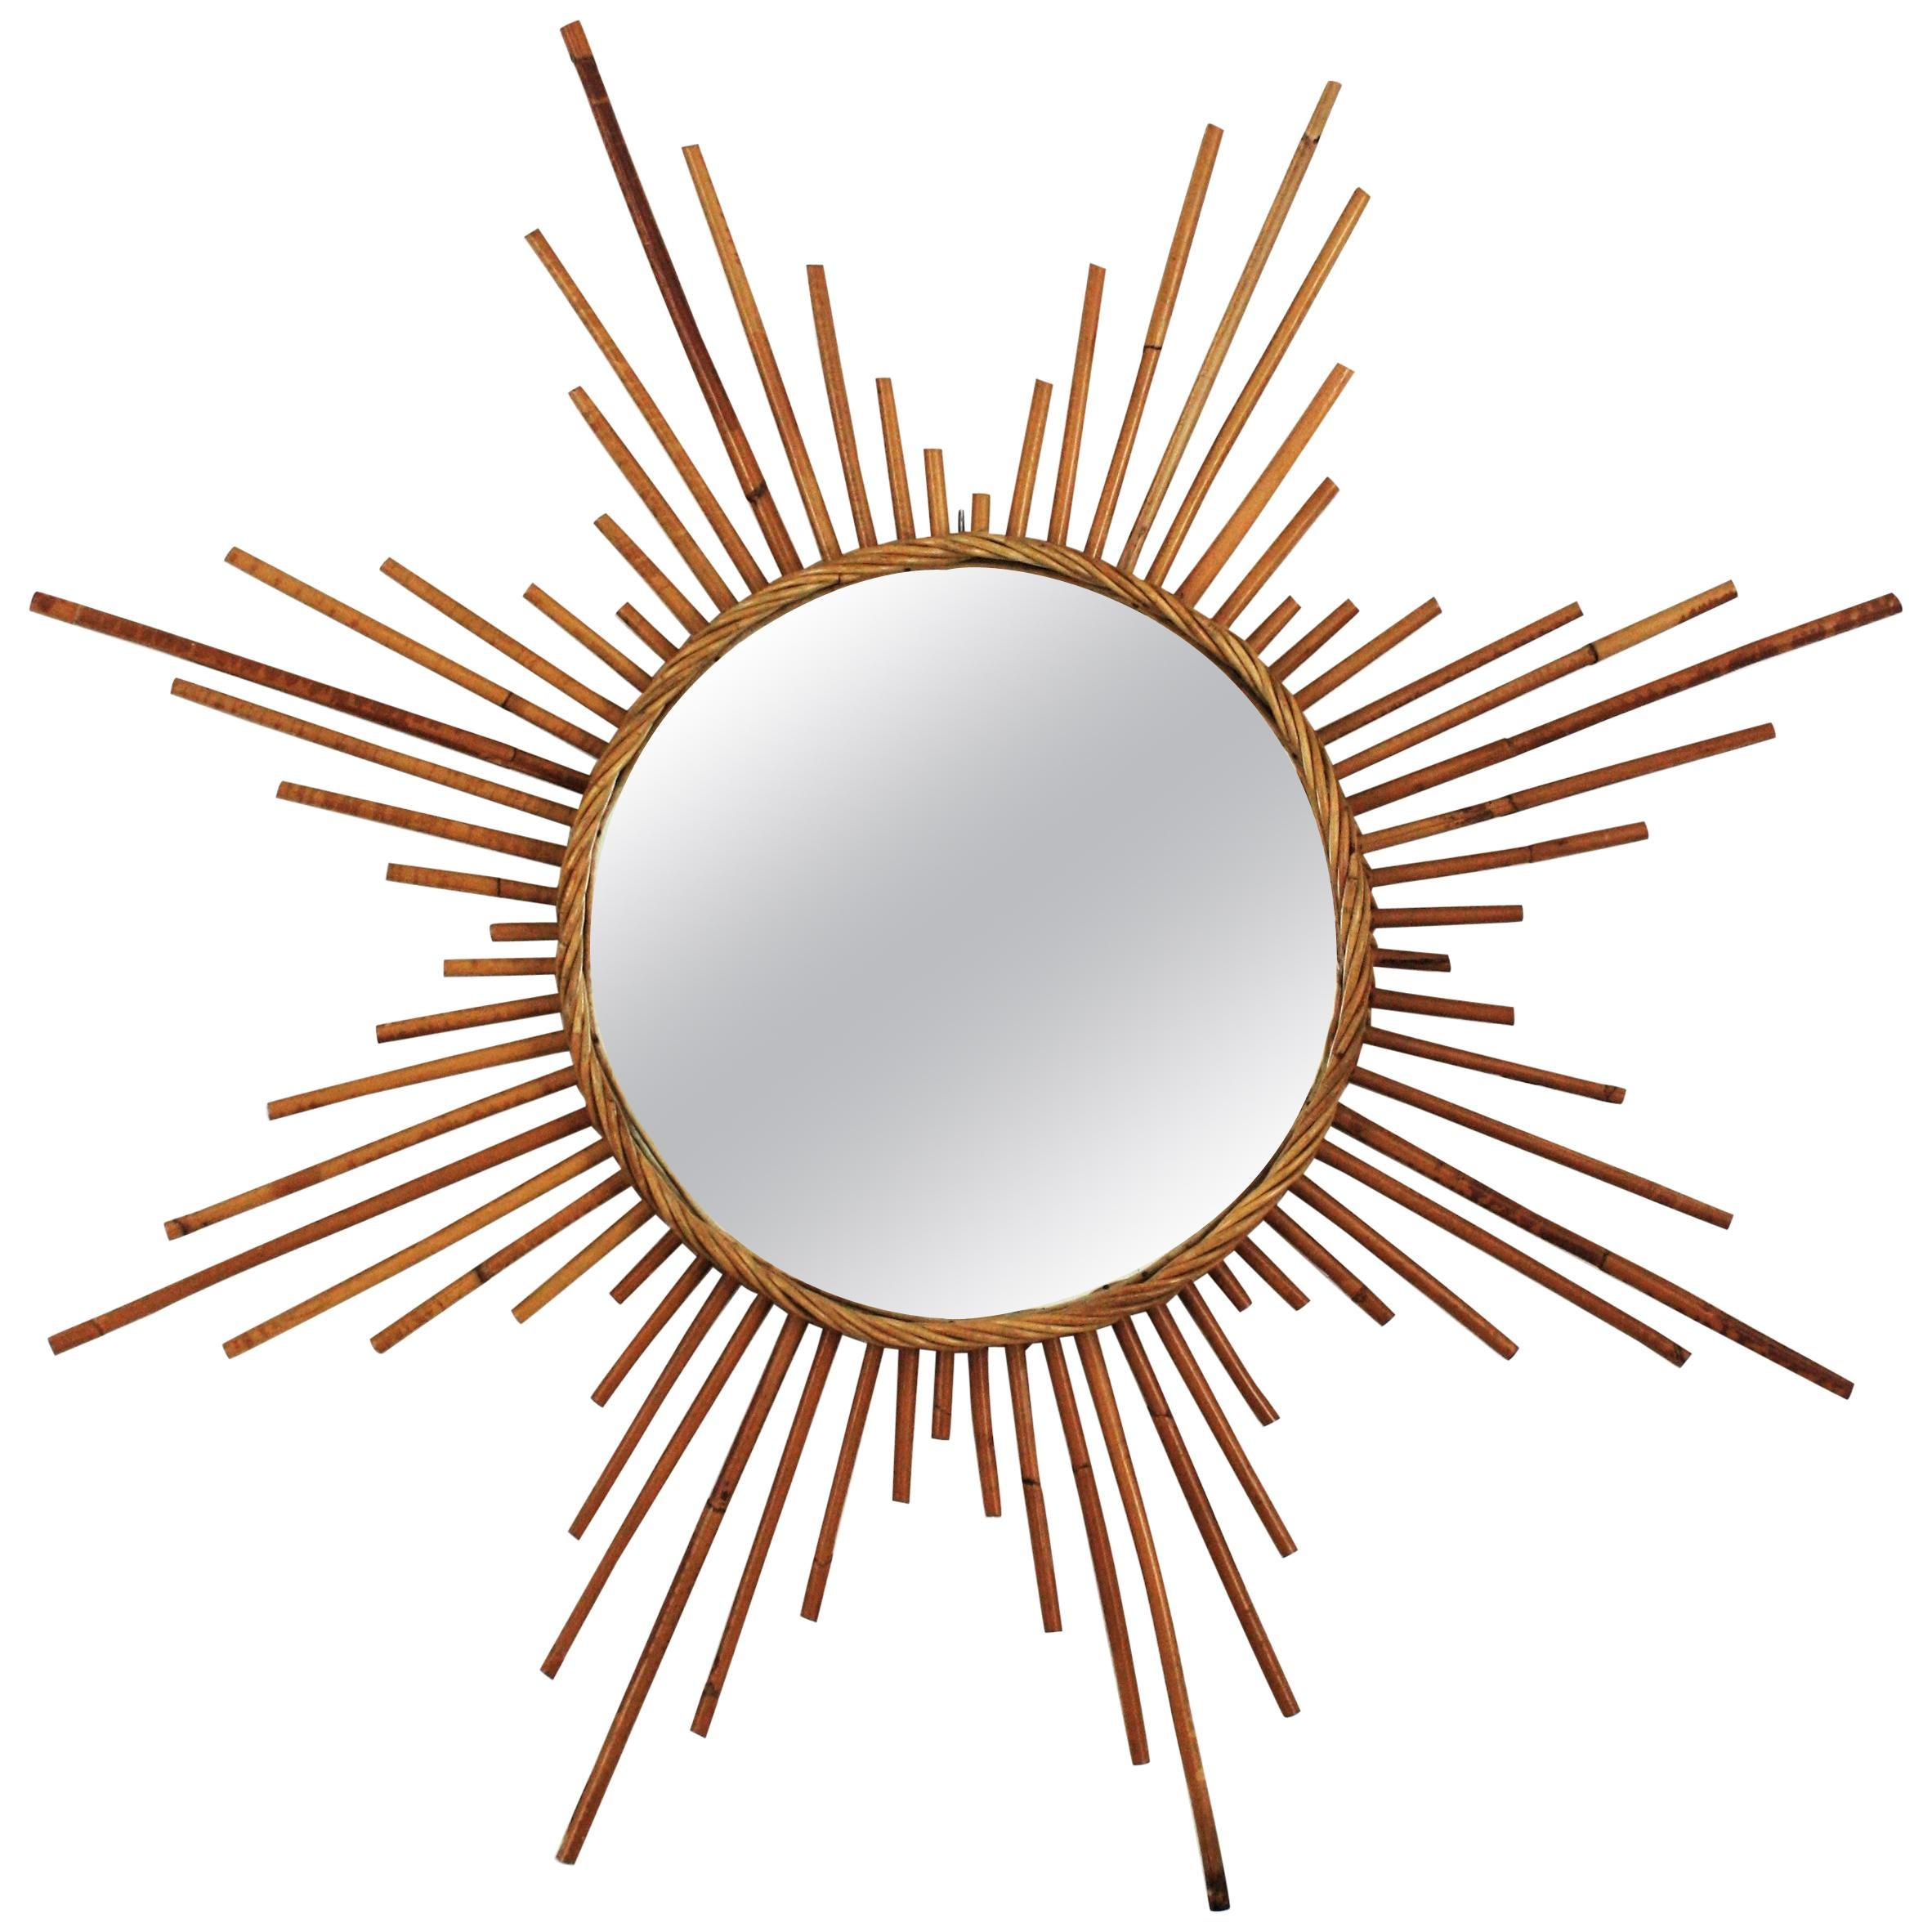 Large Rattan Sunburst Starburst Mirror, 1960s